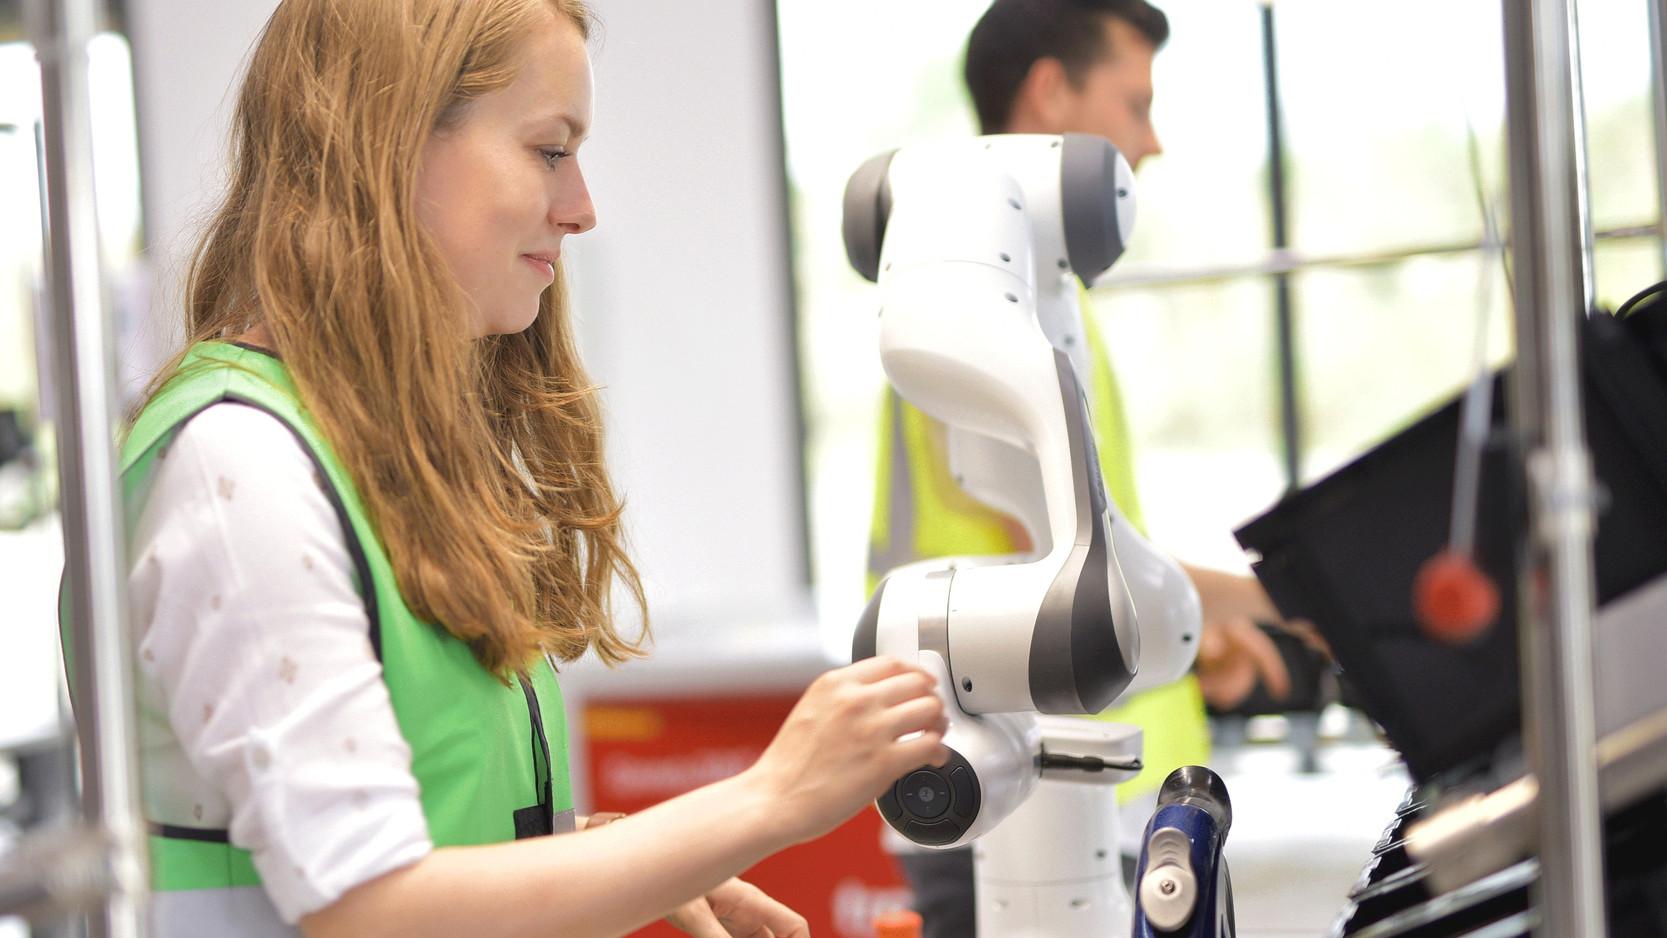 Collaborative Robot - Franka Emika